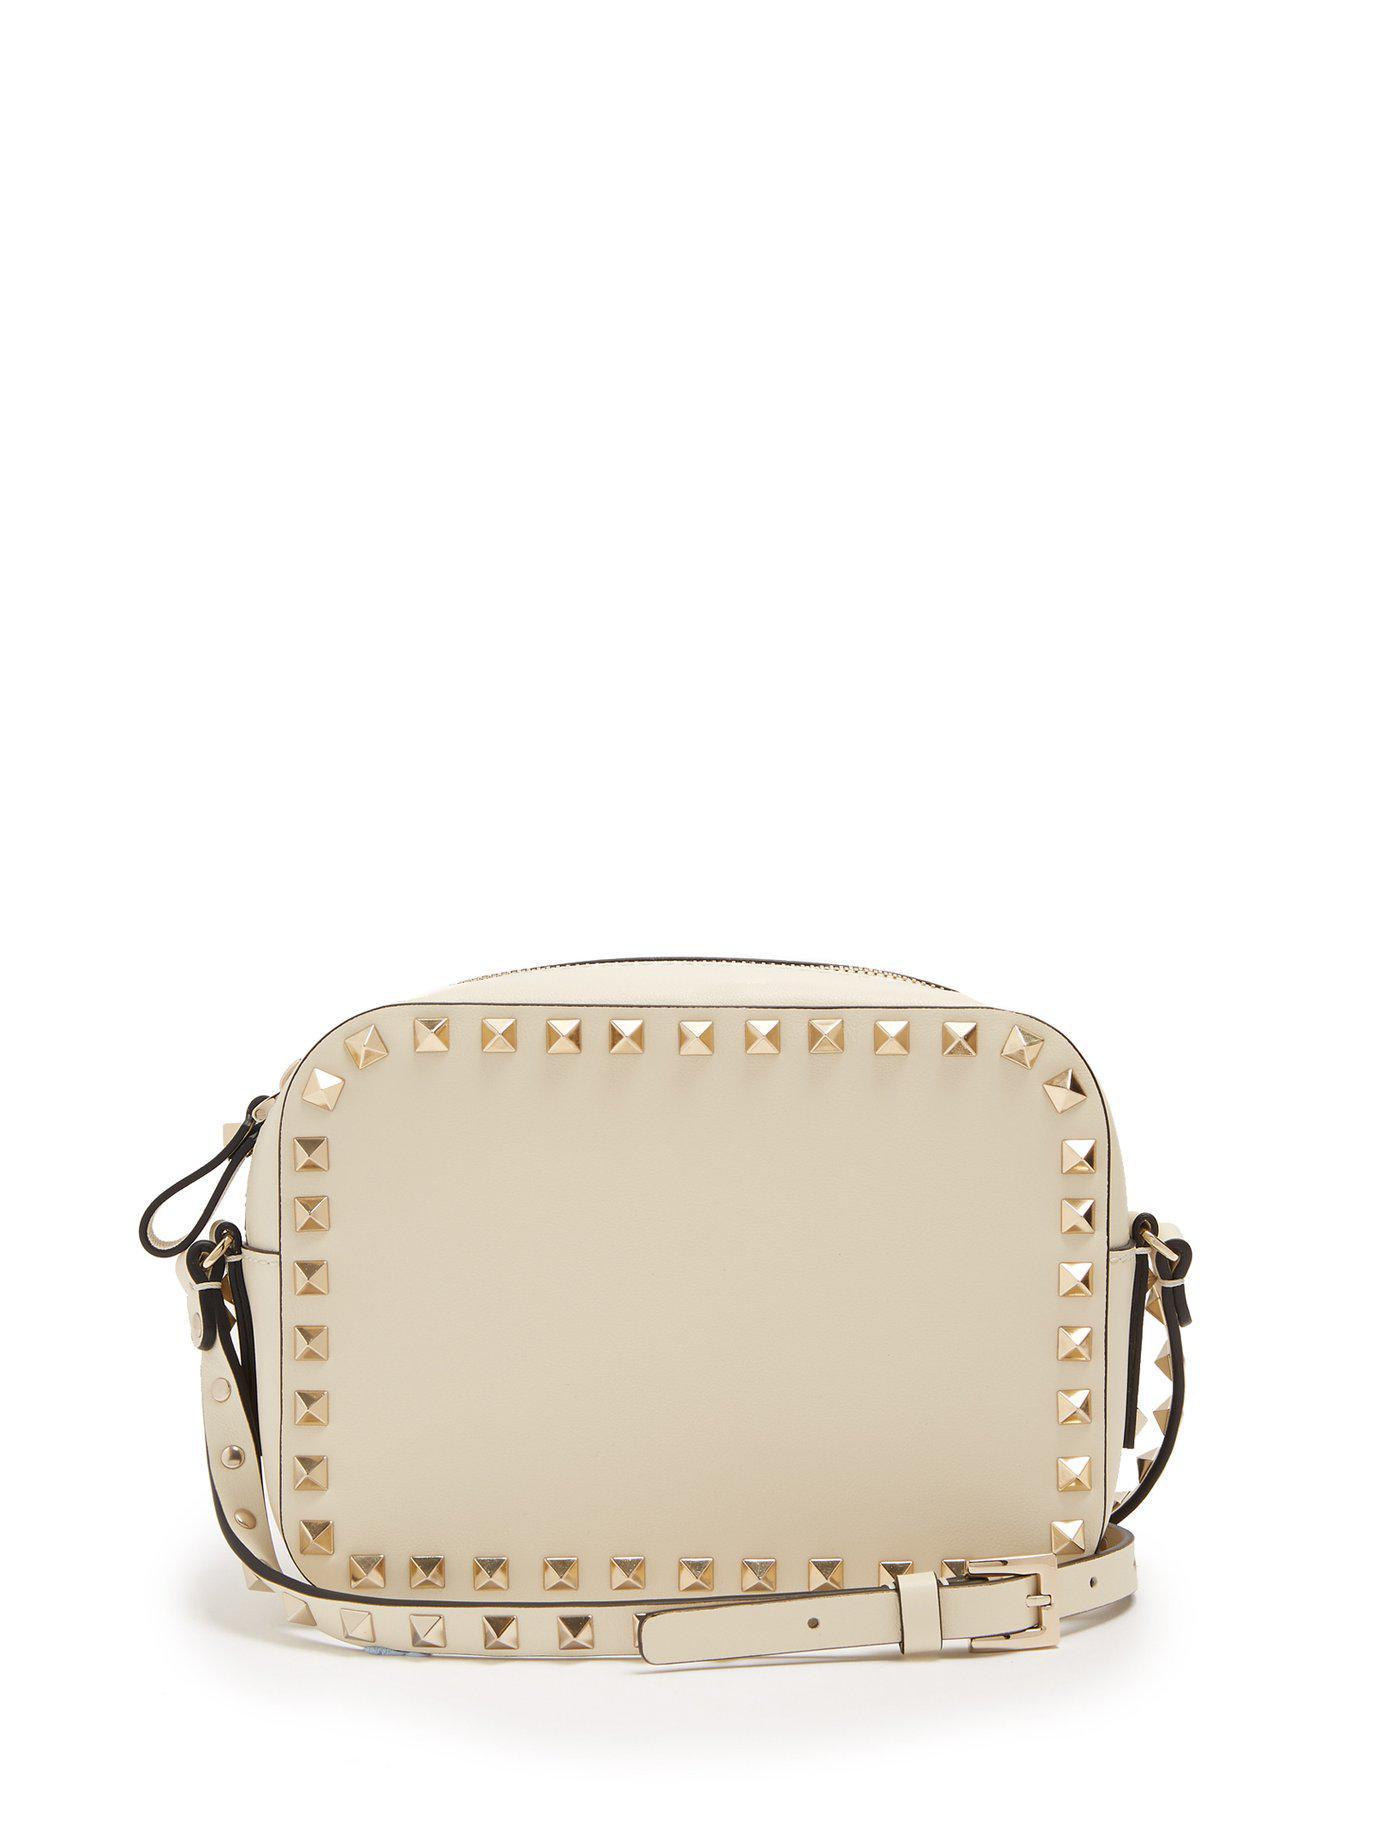 4158b914641d Lyst - Valentino Rockstud Camera Leather Cross Body Bag in White